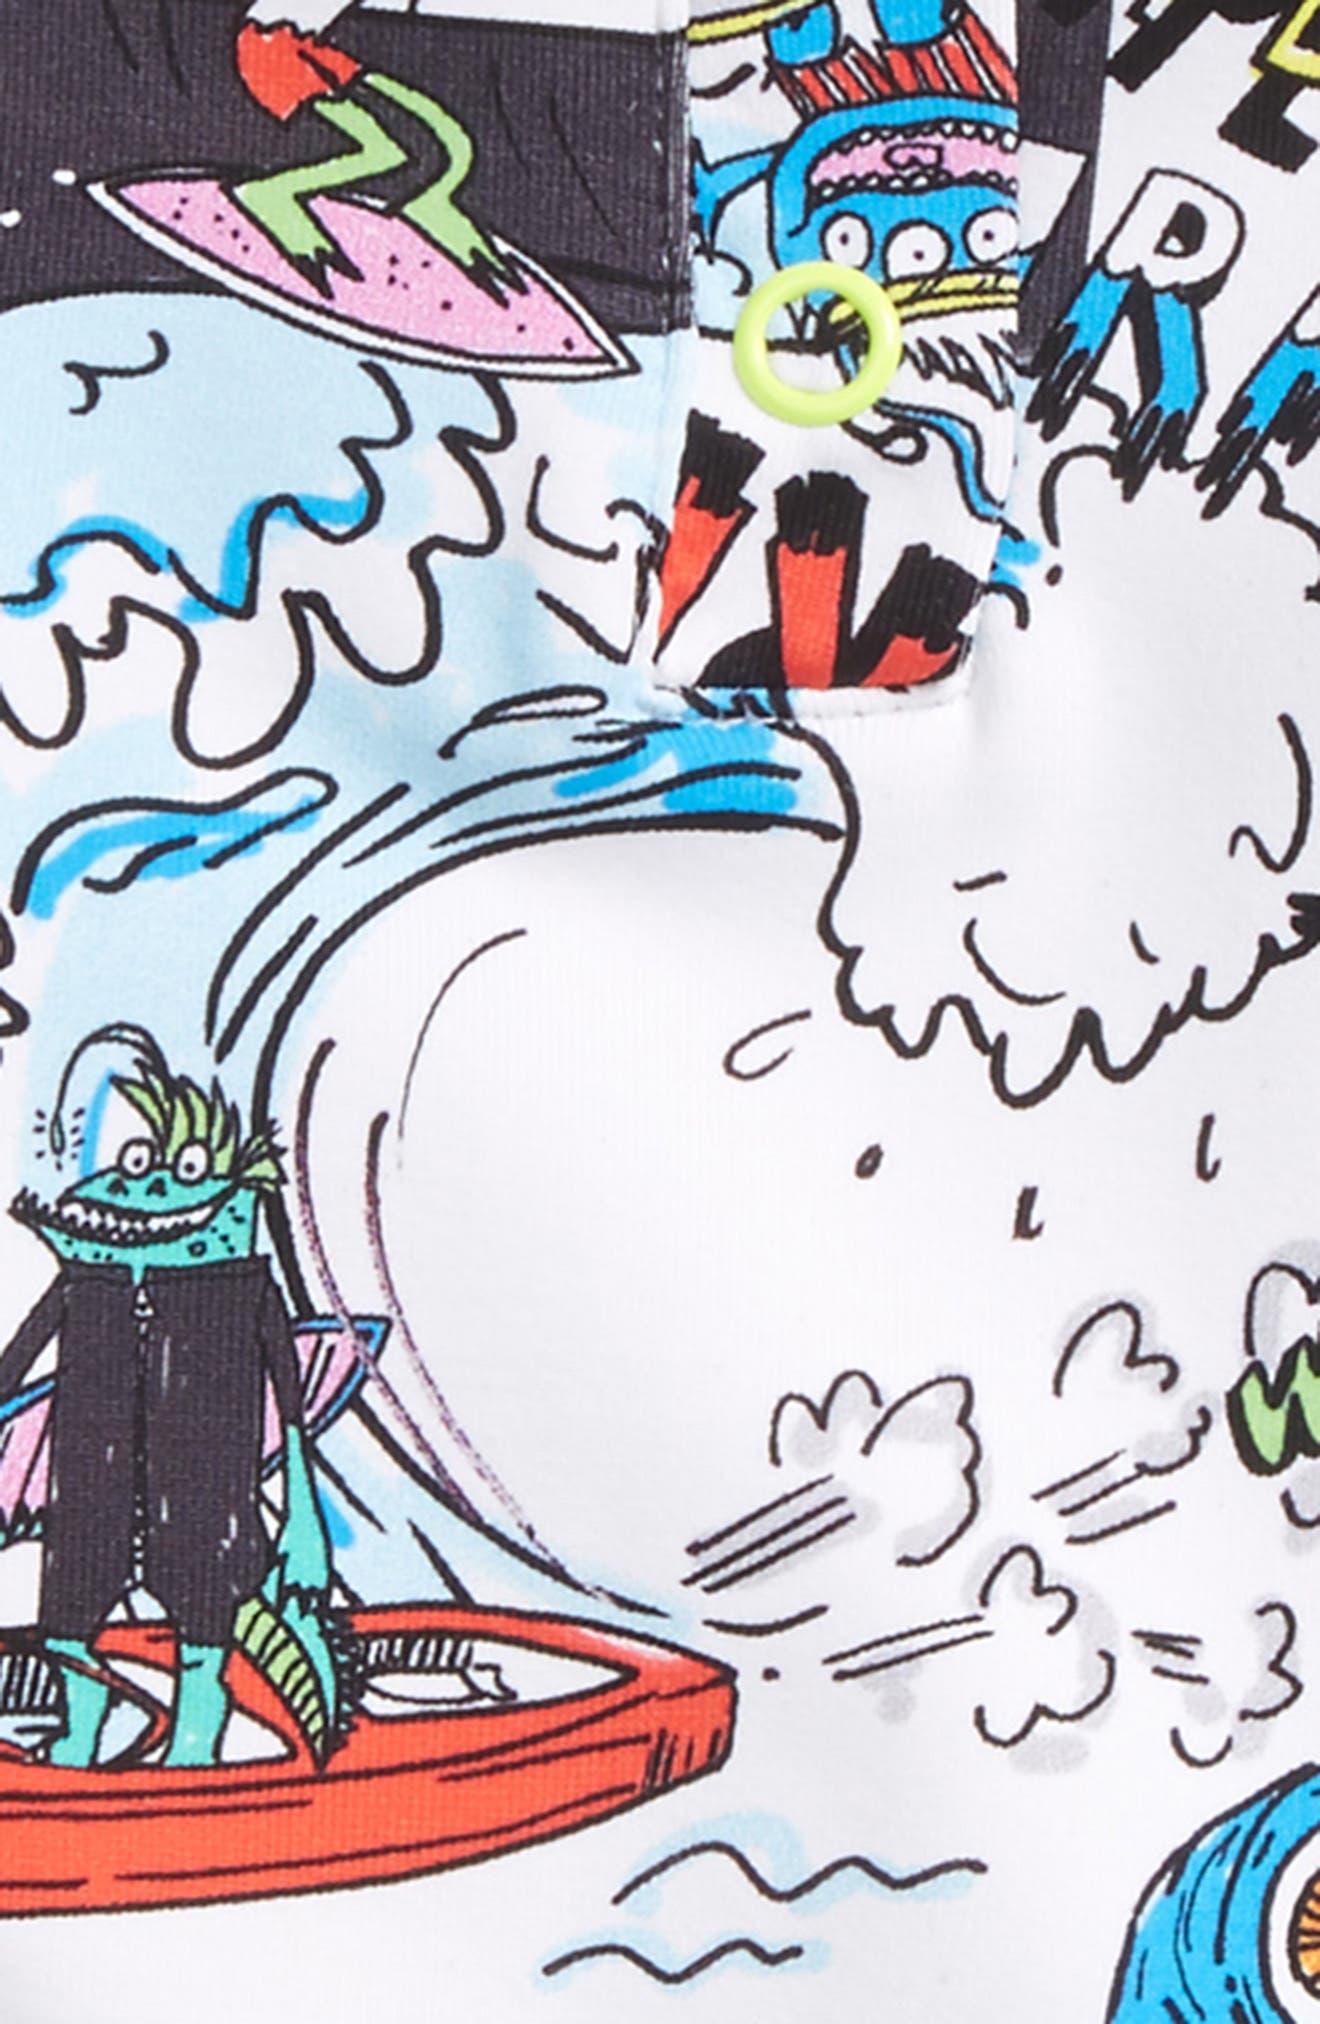 Boppers Cartoon Print Two-Piece Rashguard Swimsuit,                             Alternate thumbnail 2, color,